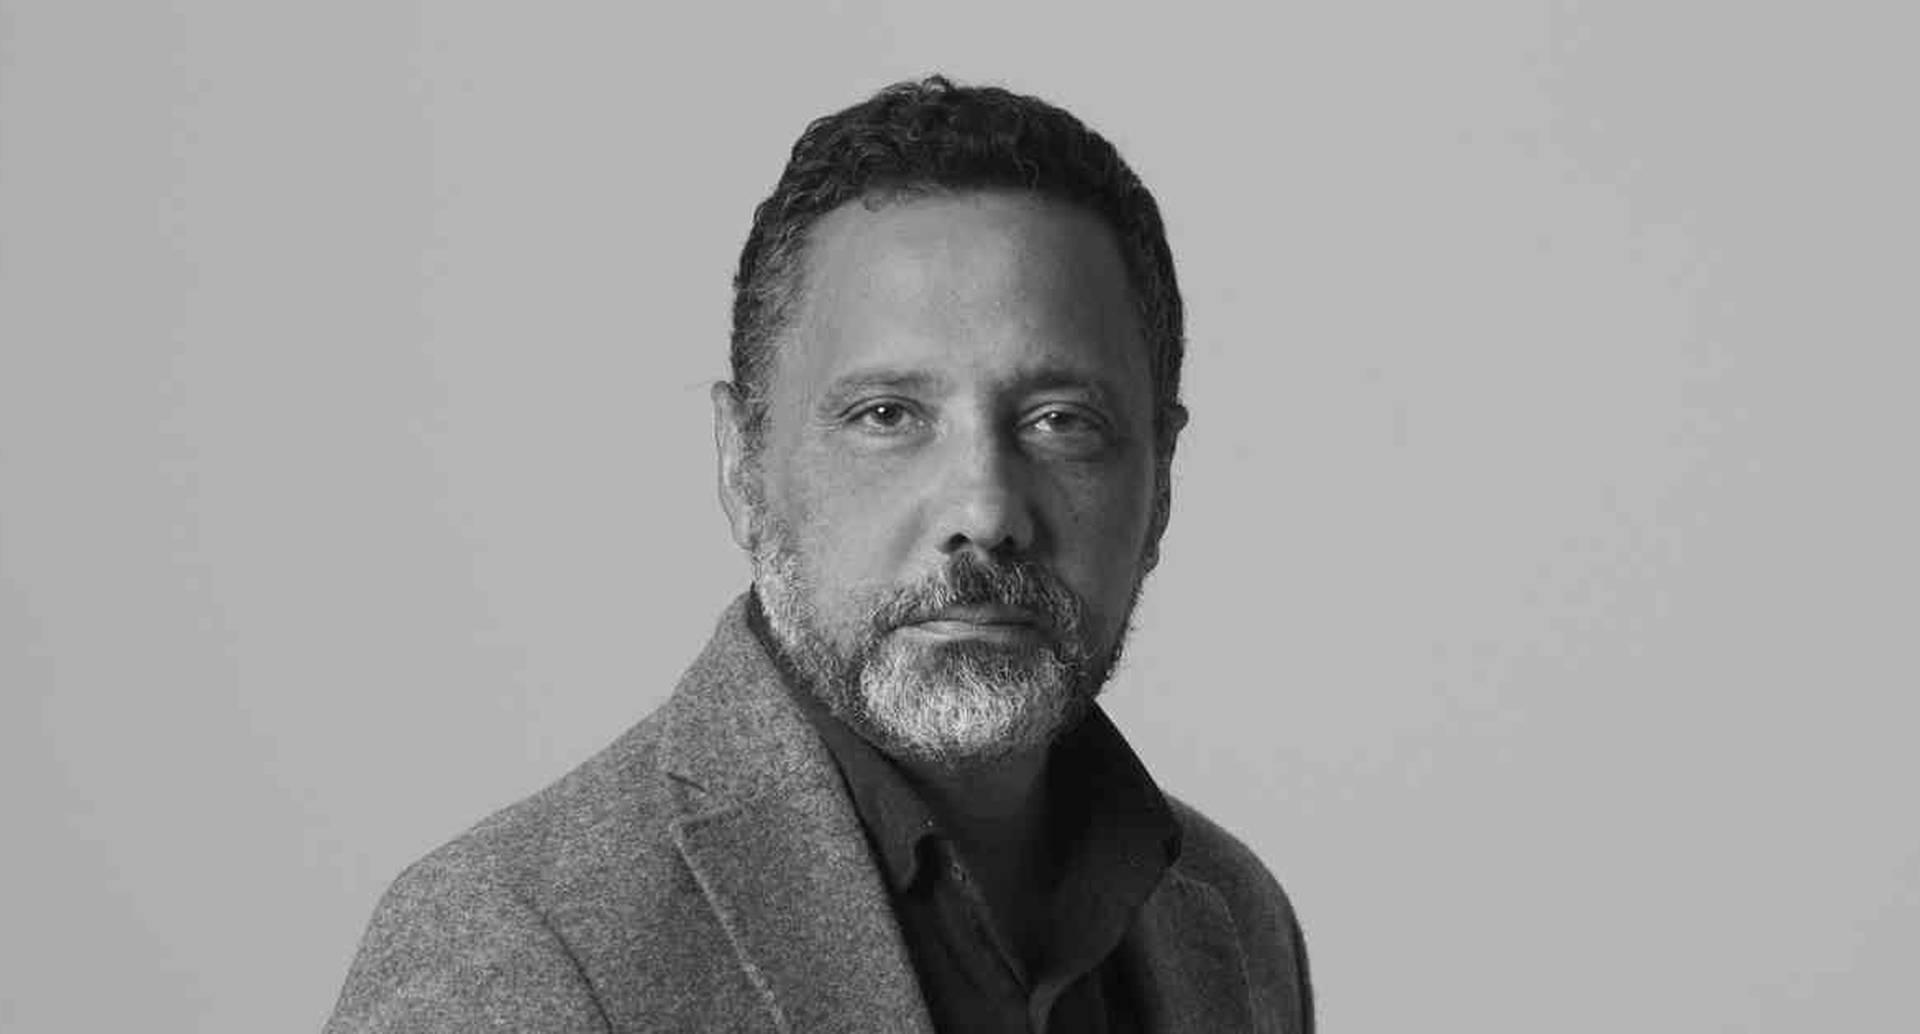 Columna de opinión Alonso Sánchez Baute